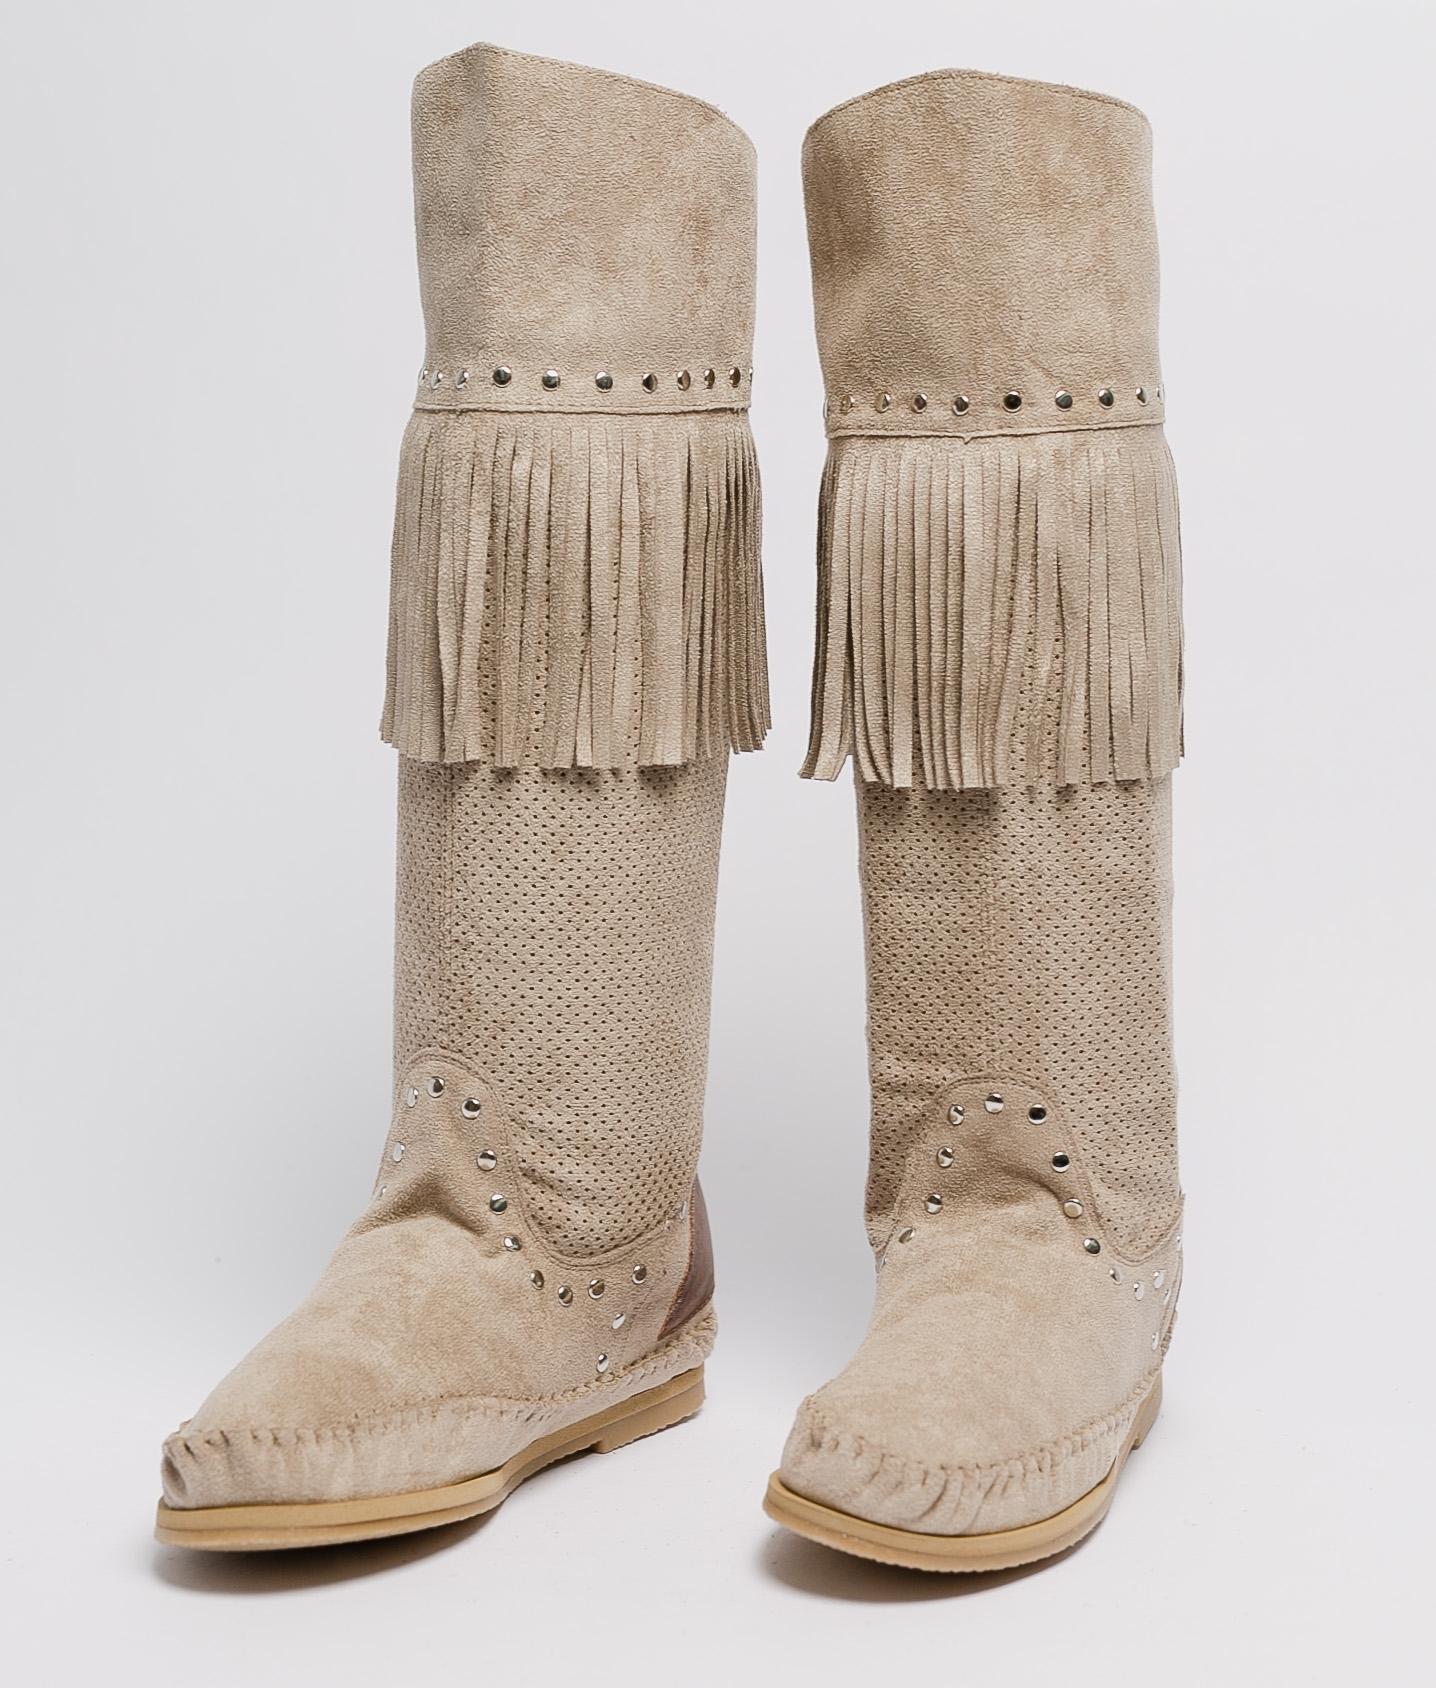 Stivali Indianini Sarale - Beige